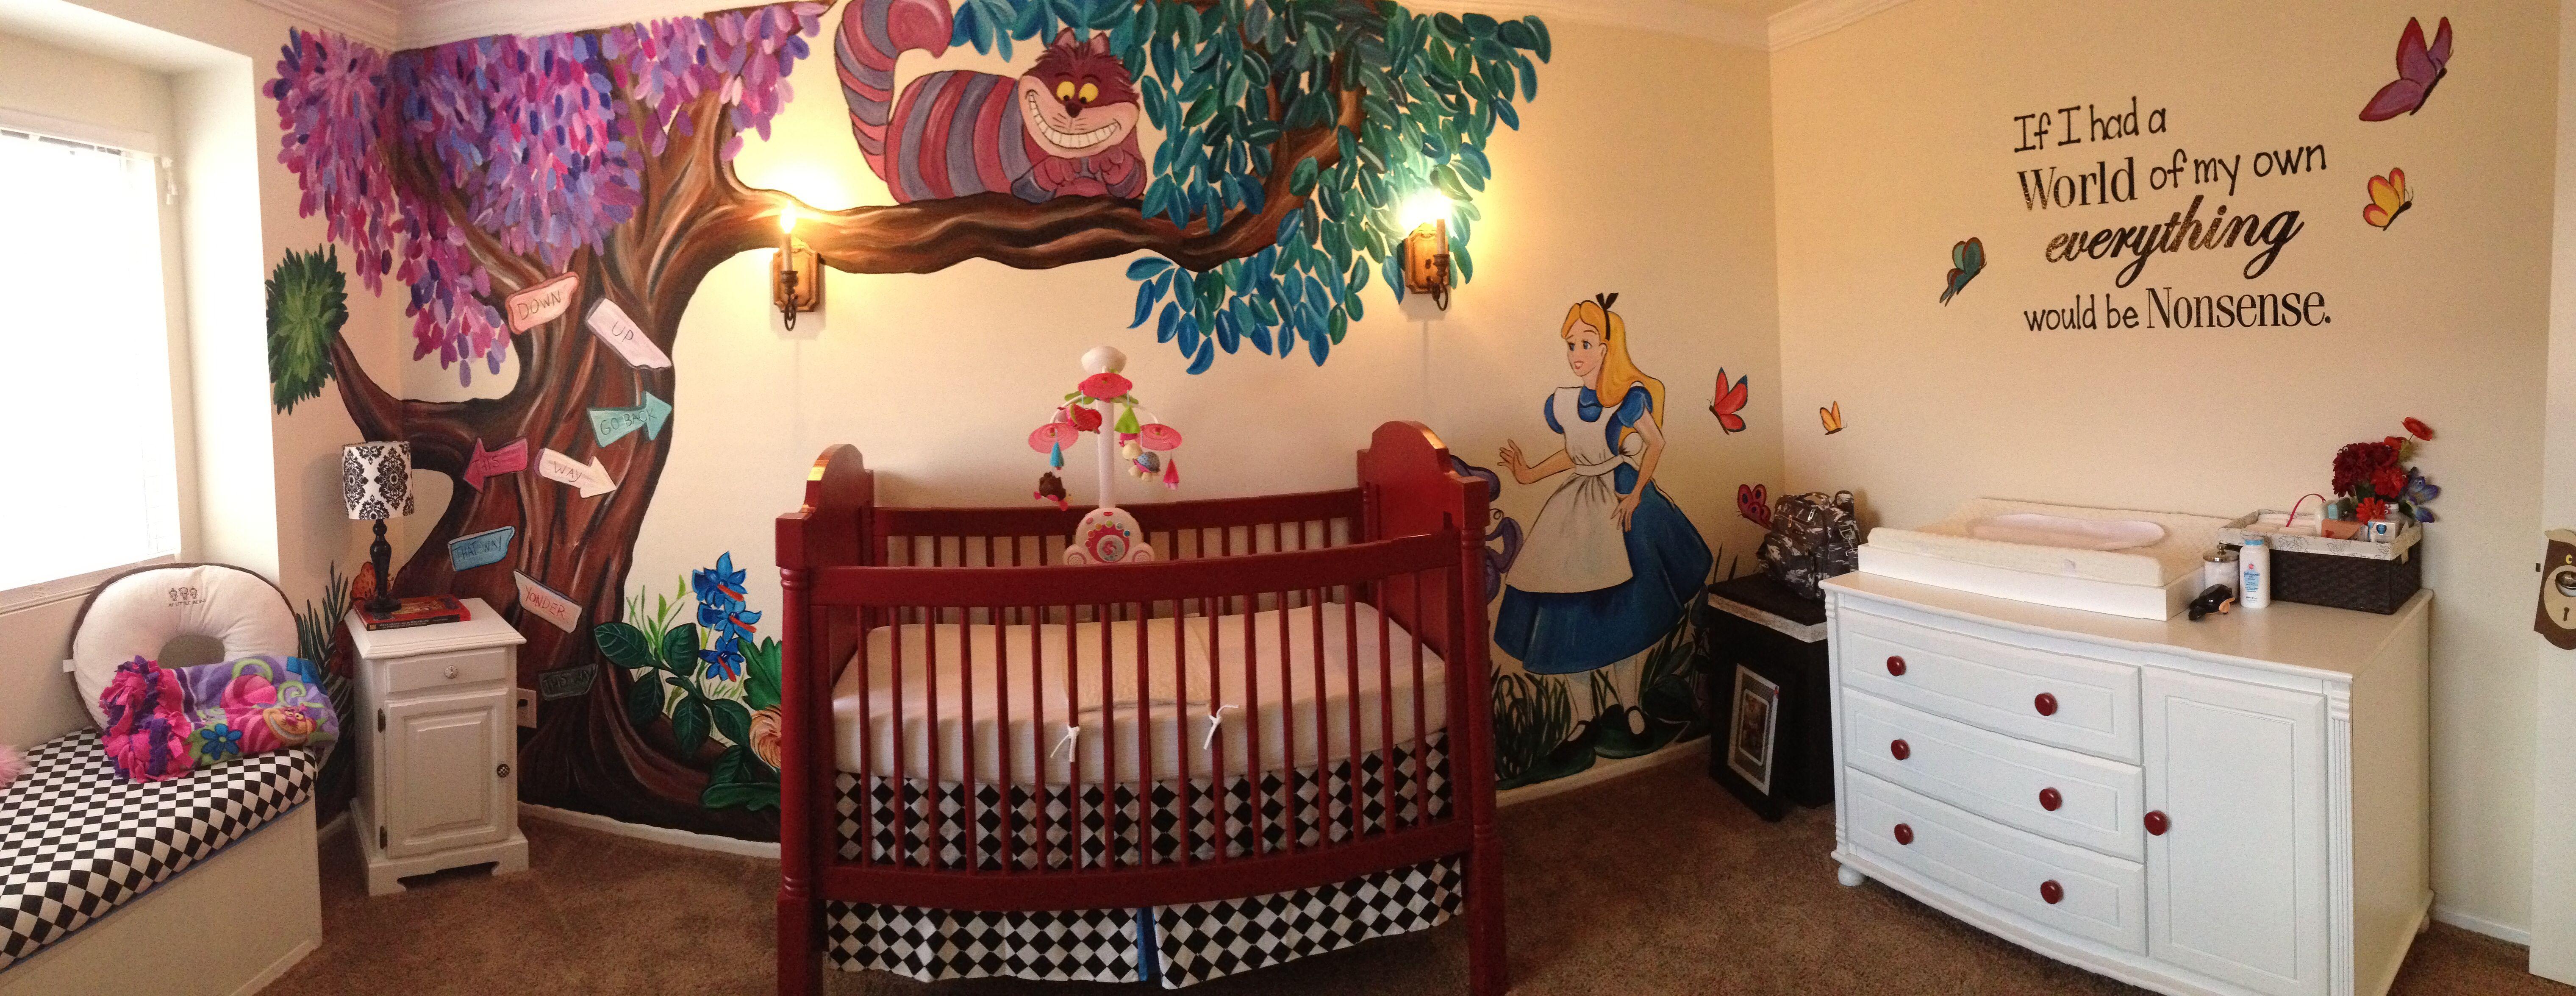 Alice in wonderland mural disney decor products for Alice in wonderland mural